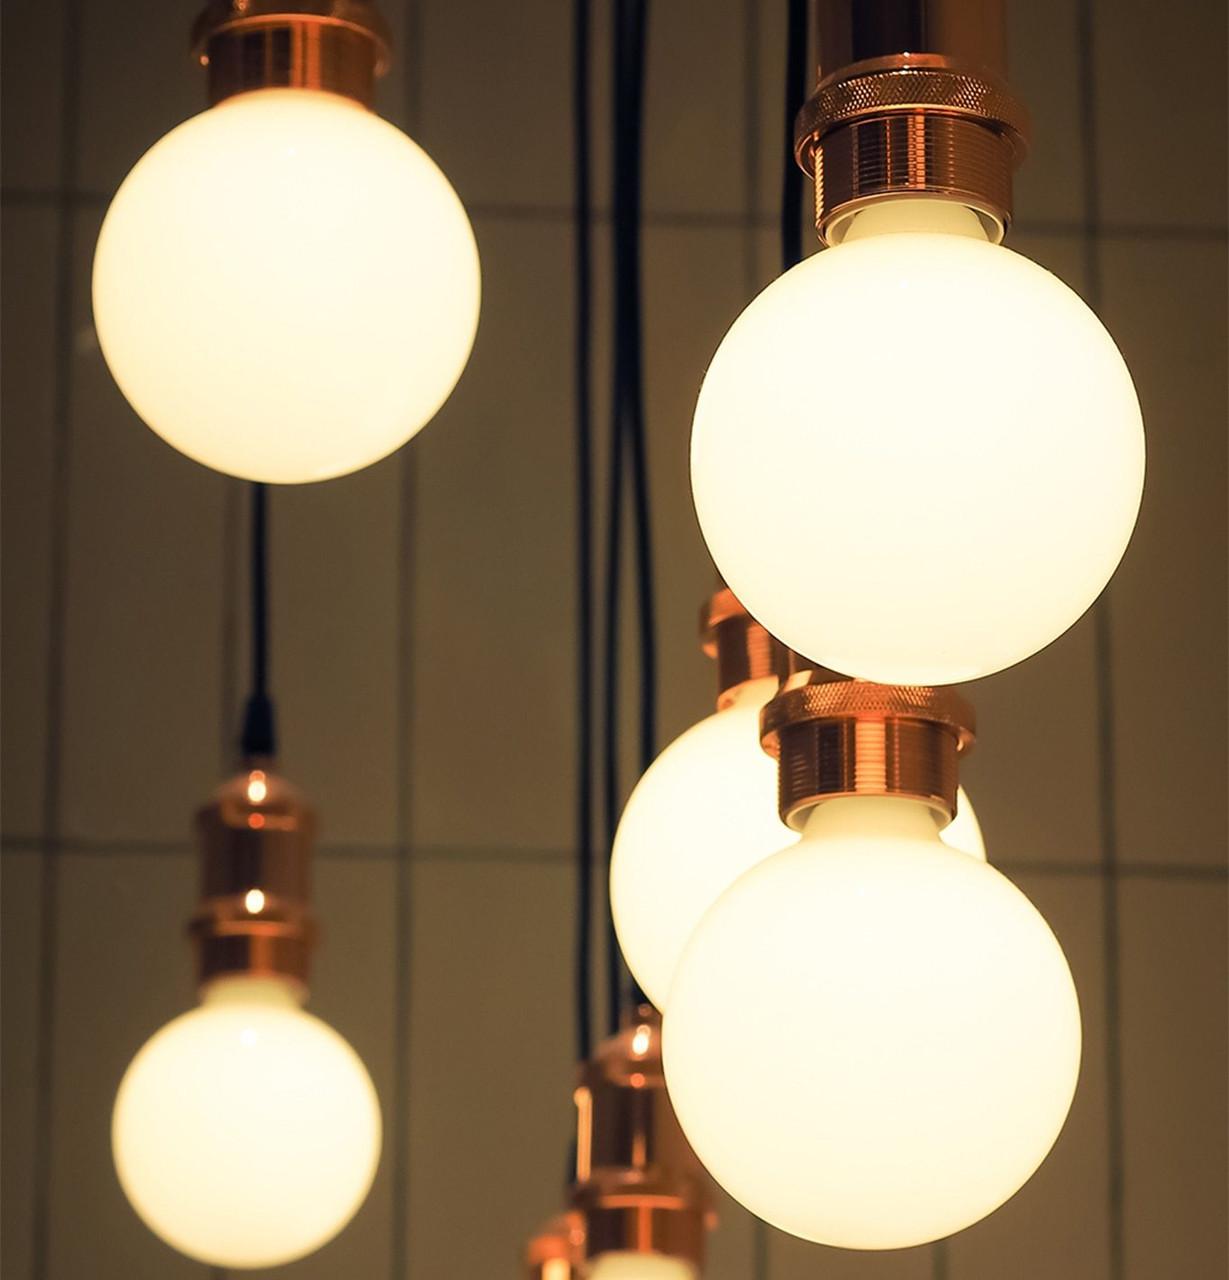 LED G95 BC-B22d Light Bulbs